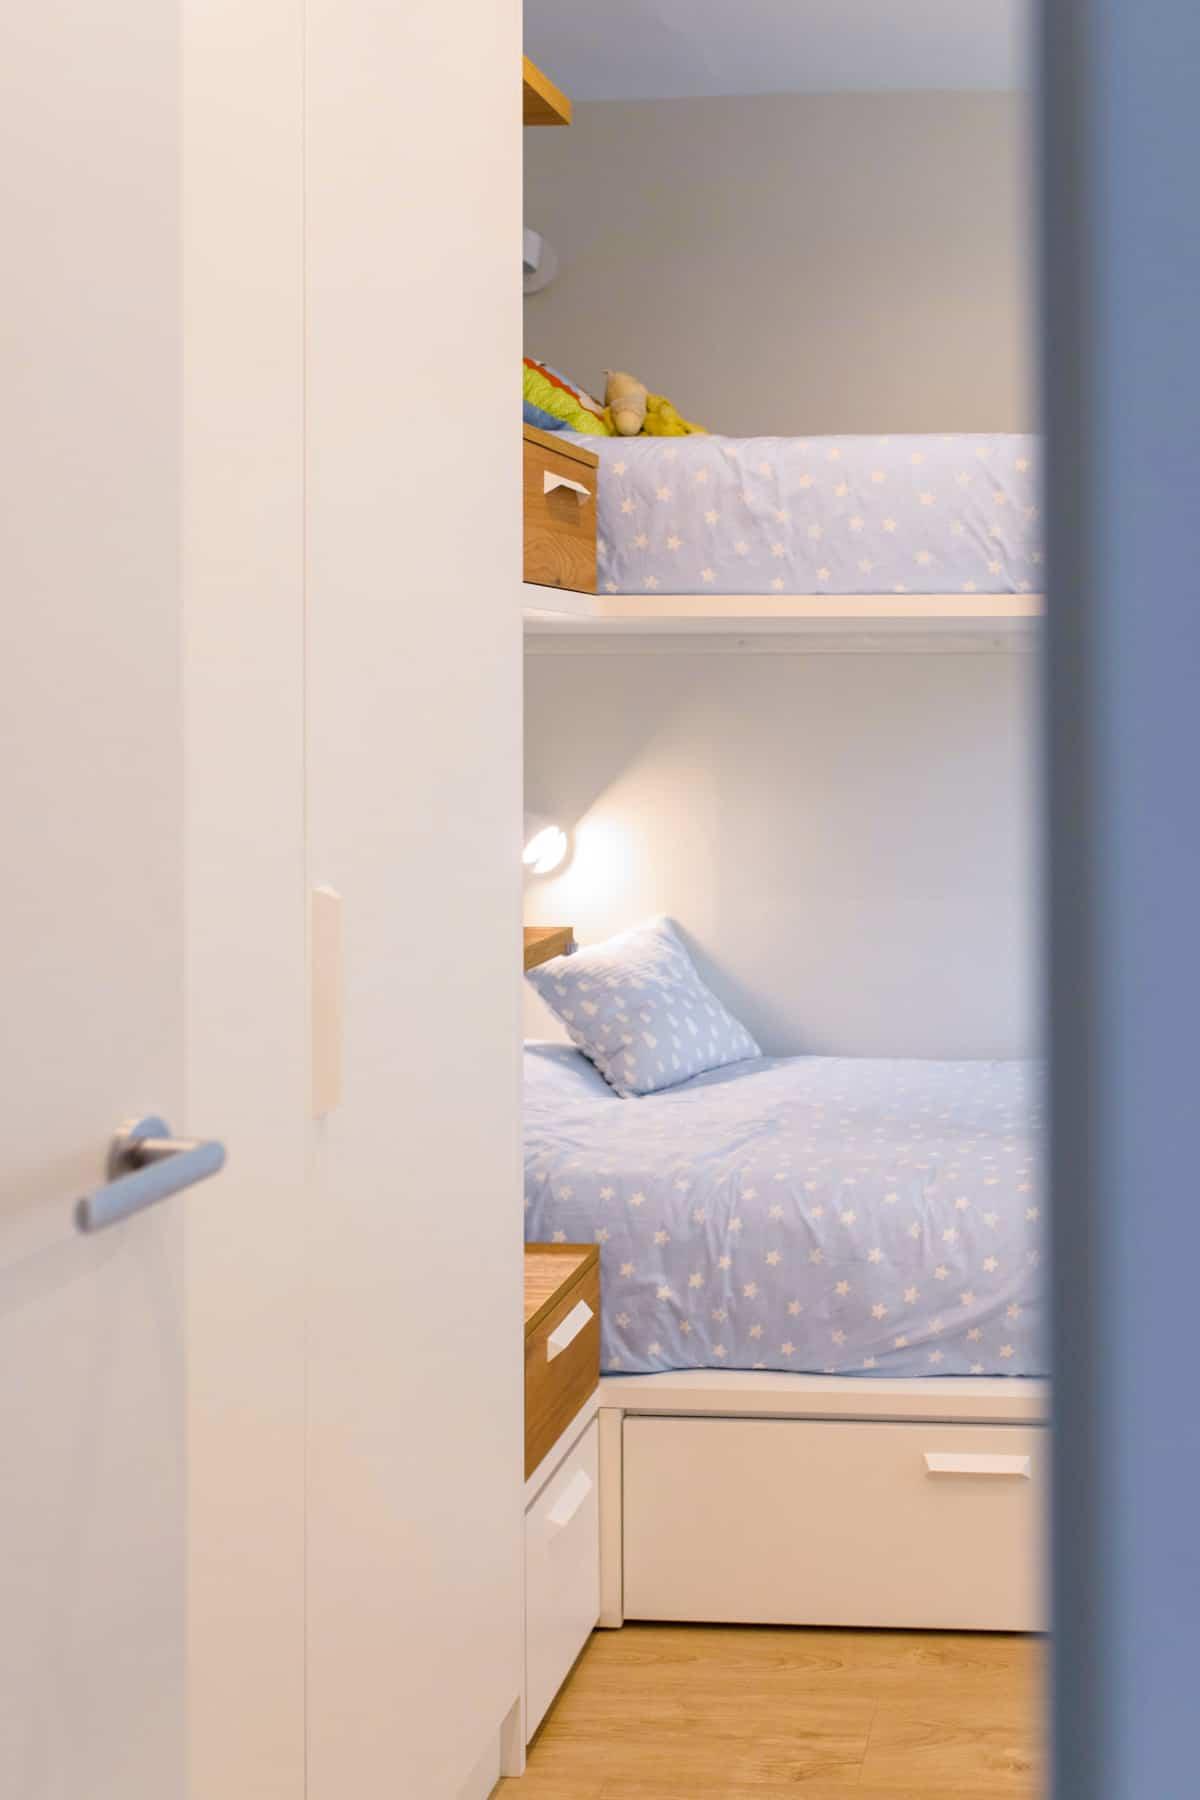 Detalle habitación infantil literas